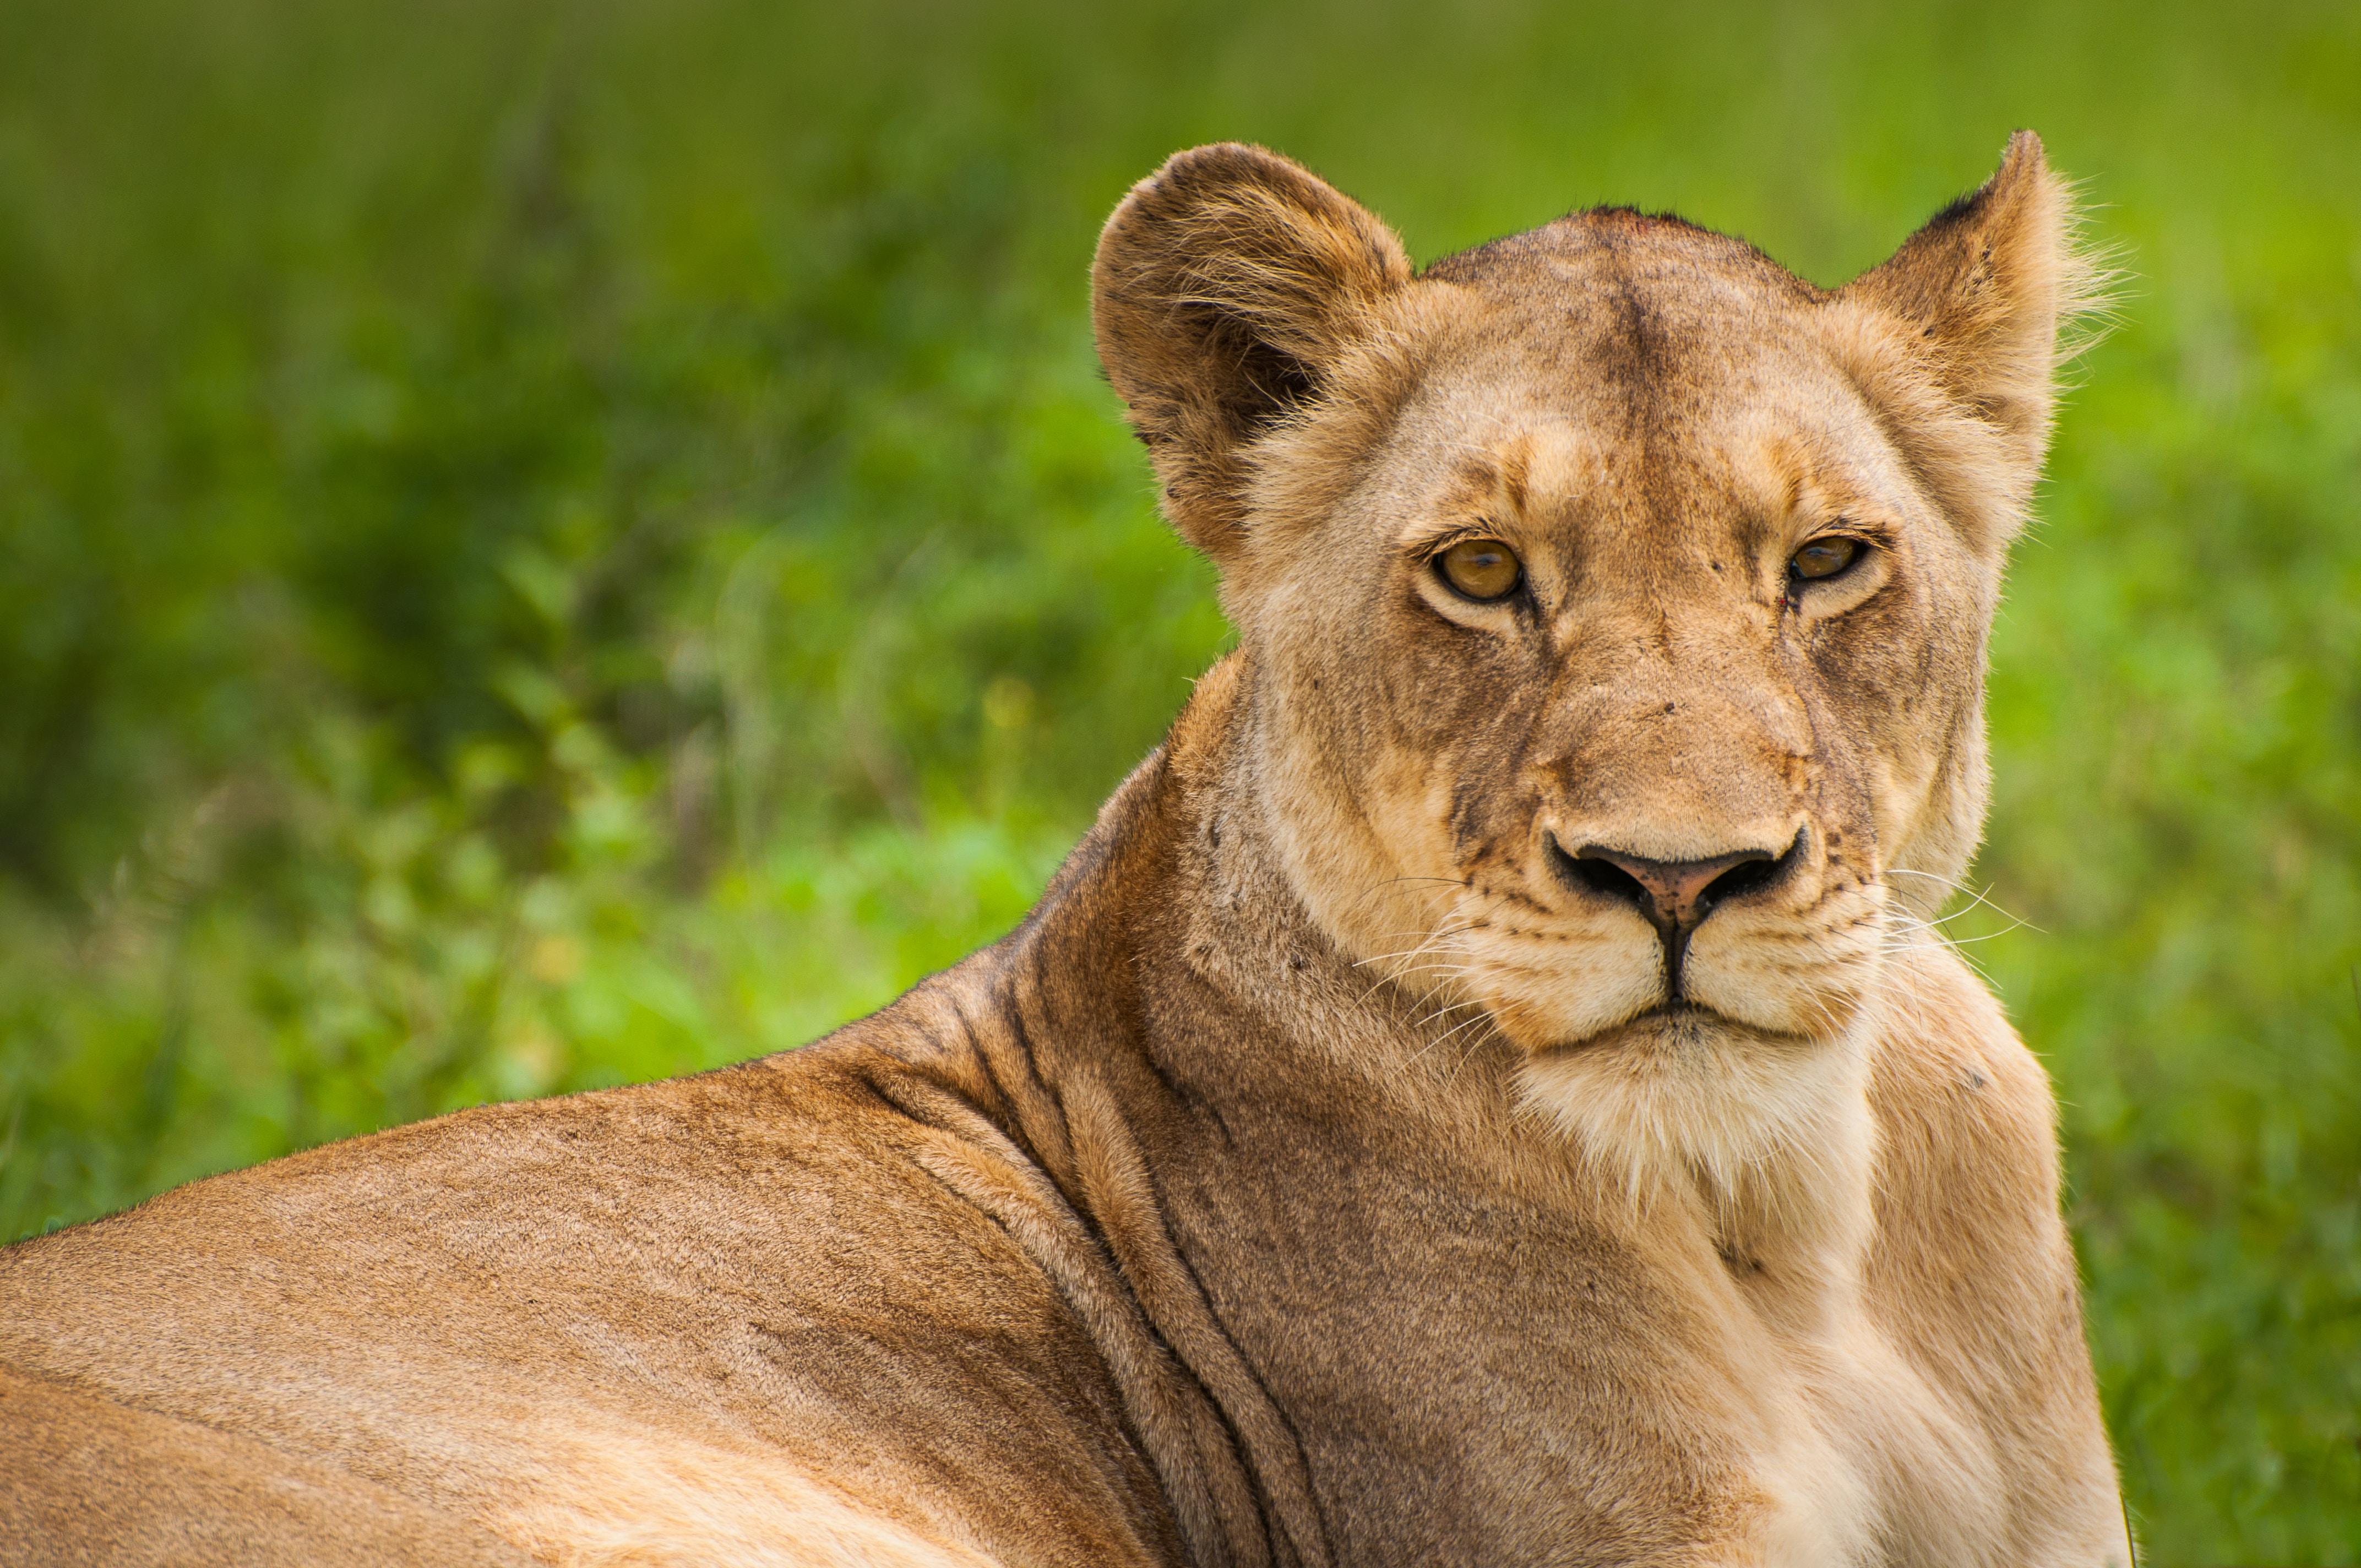 lioness on grass